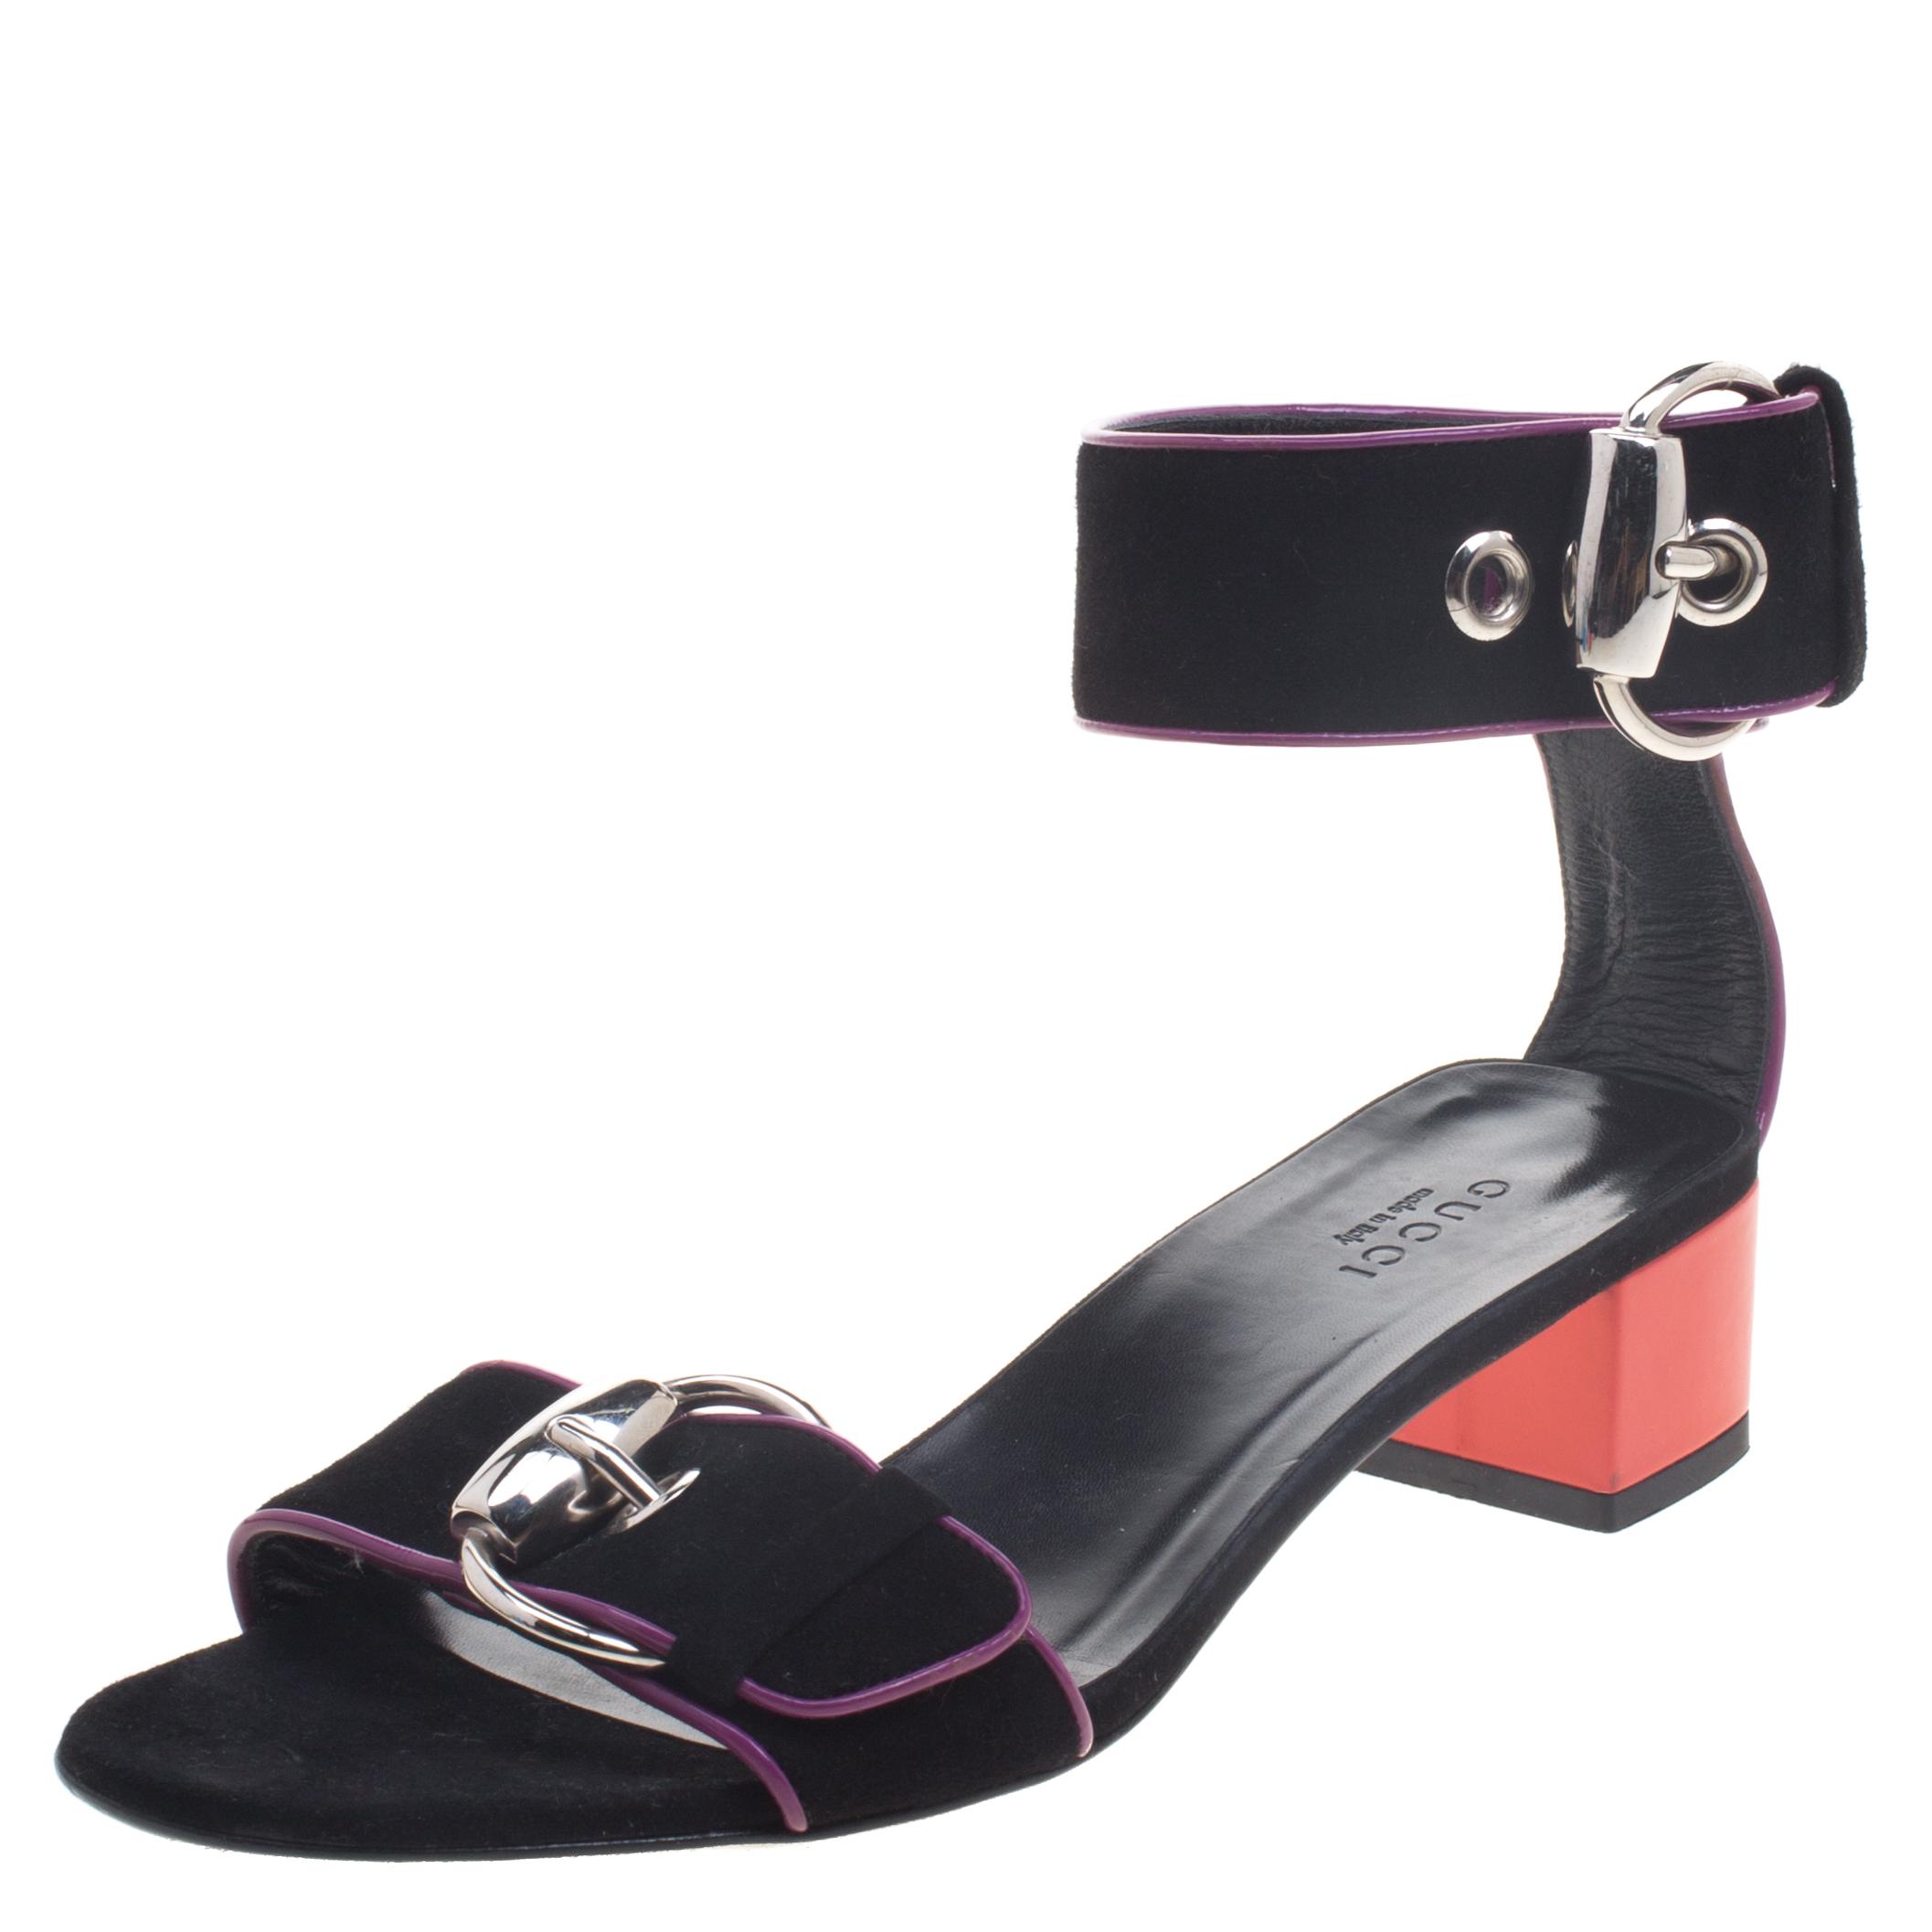 500bb0c3ed90d Buy Gucci Black Suede Horsebit Buckle Ankle Strap Block Heel Sandals ...